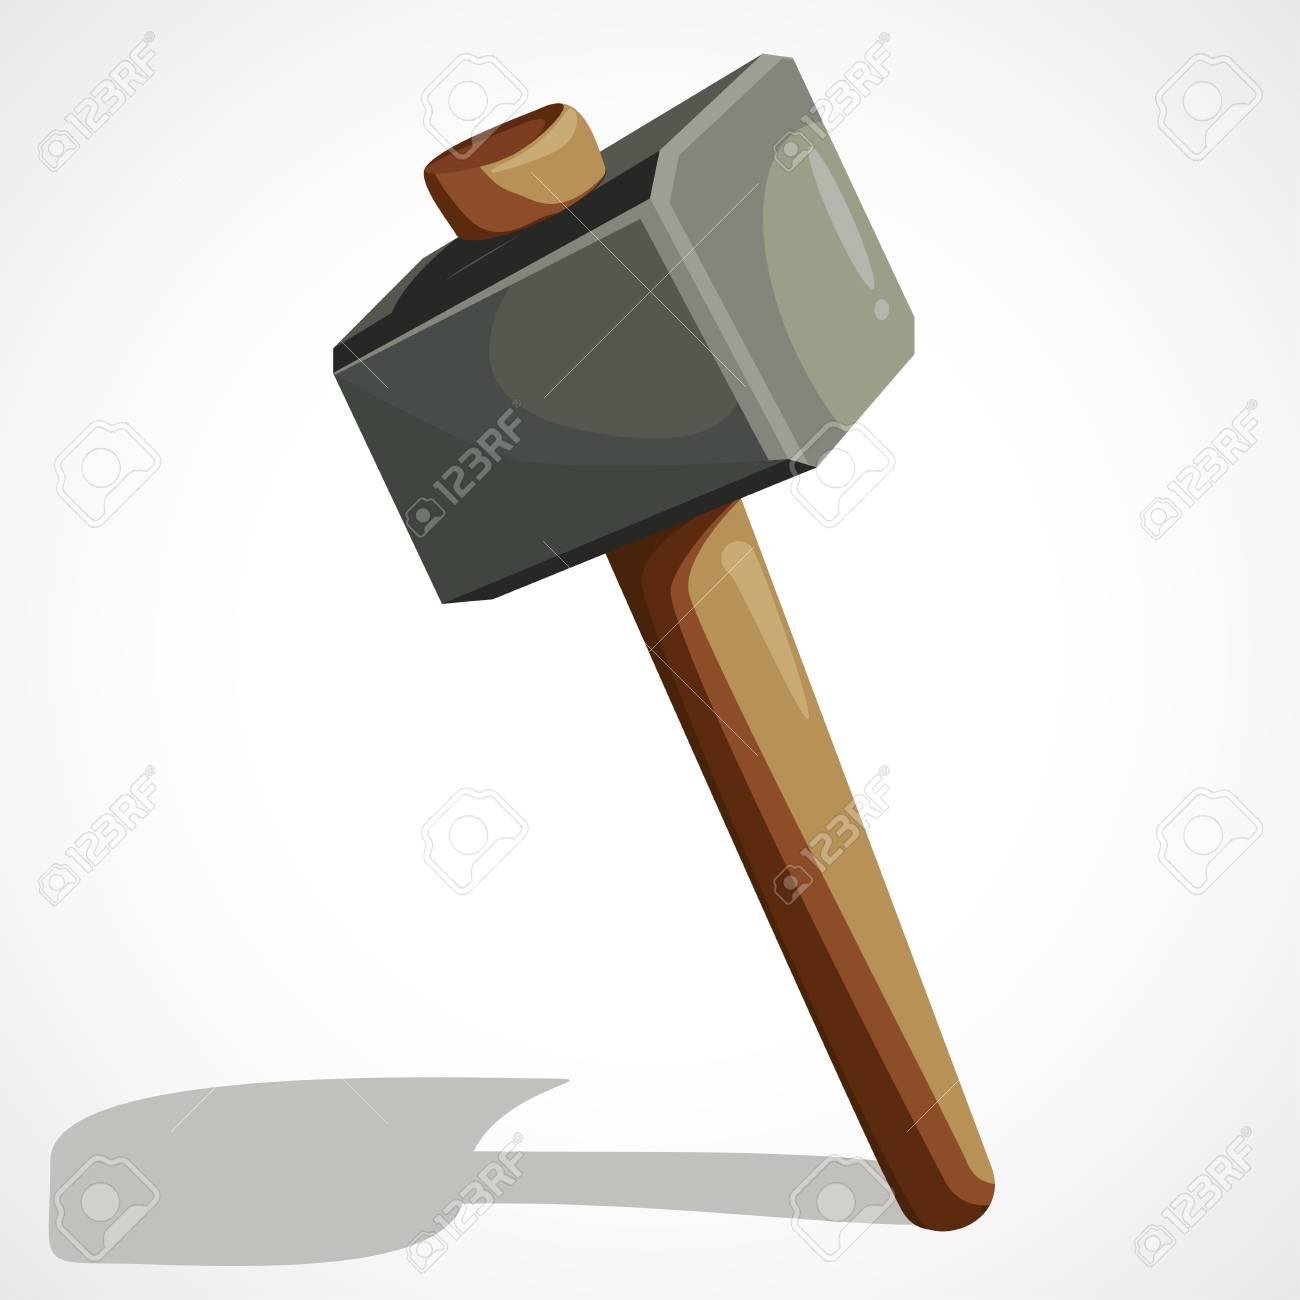 Cartoon sledgehammer tool. Sledgehammer vector stock illustration. - 97853190